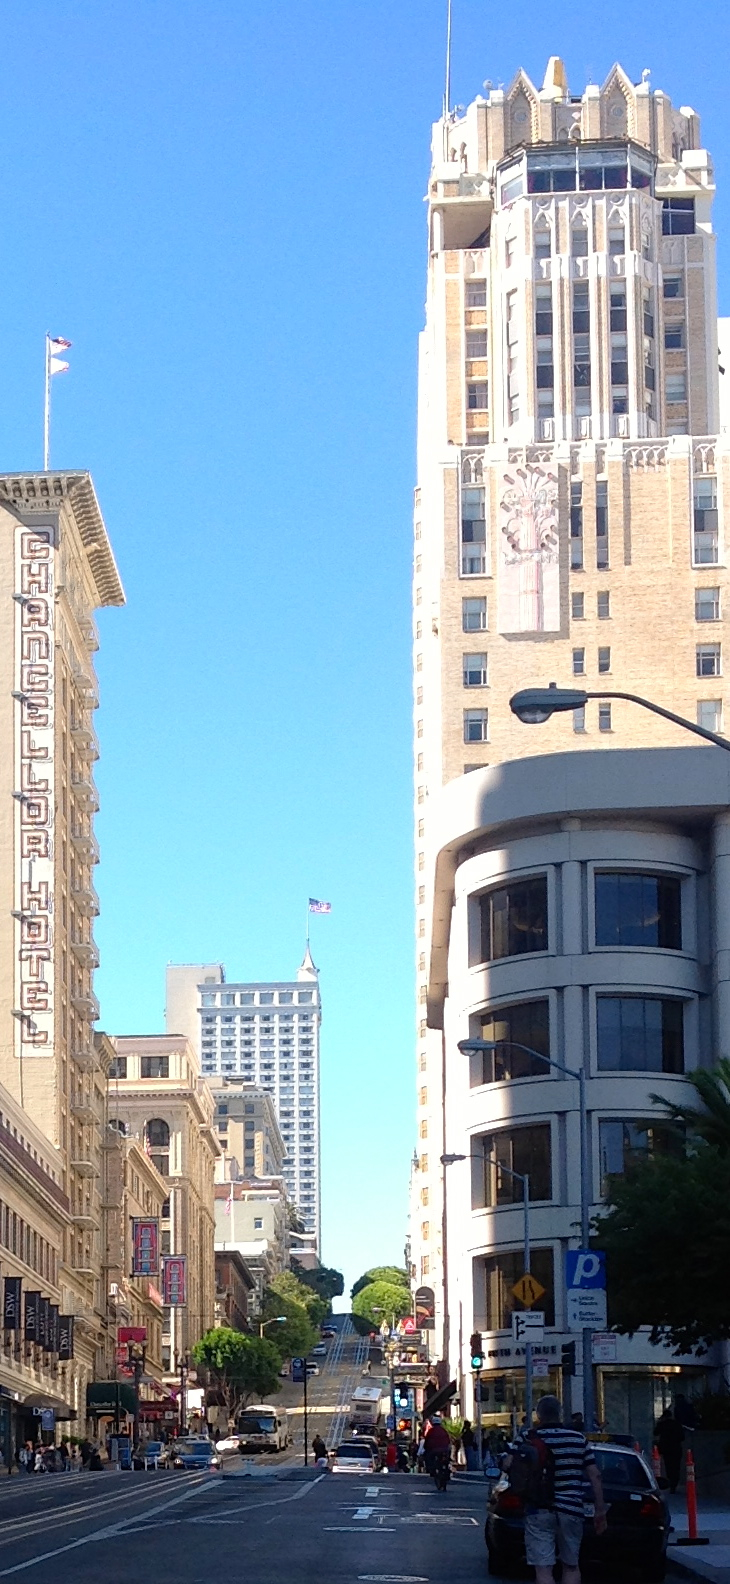 Edge of Union Square, SF